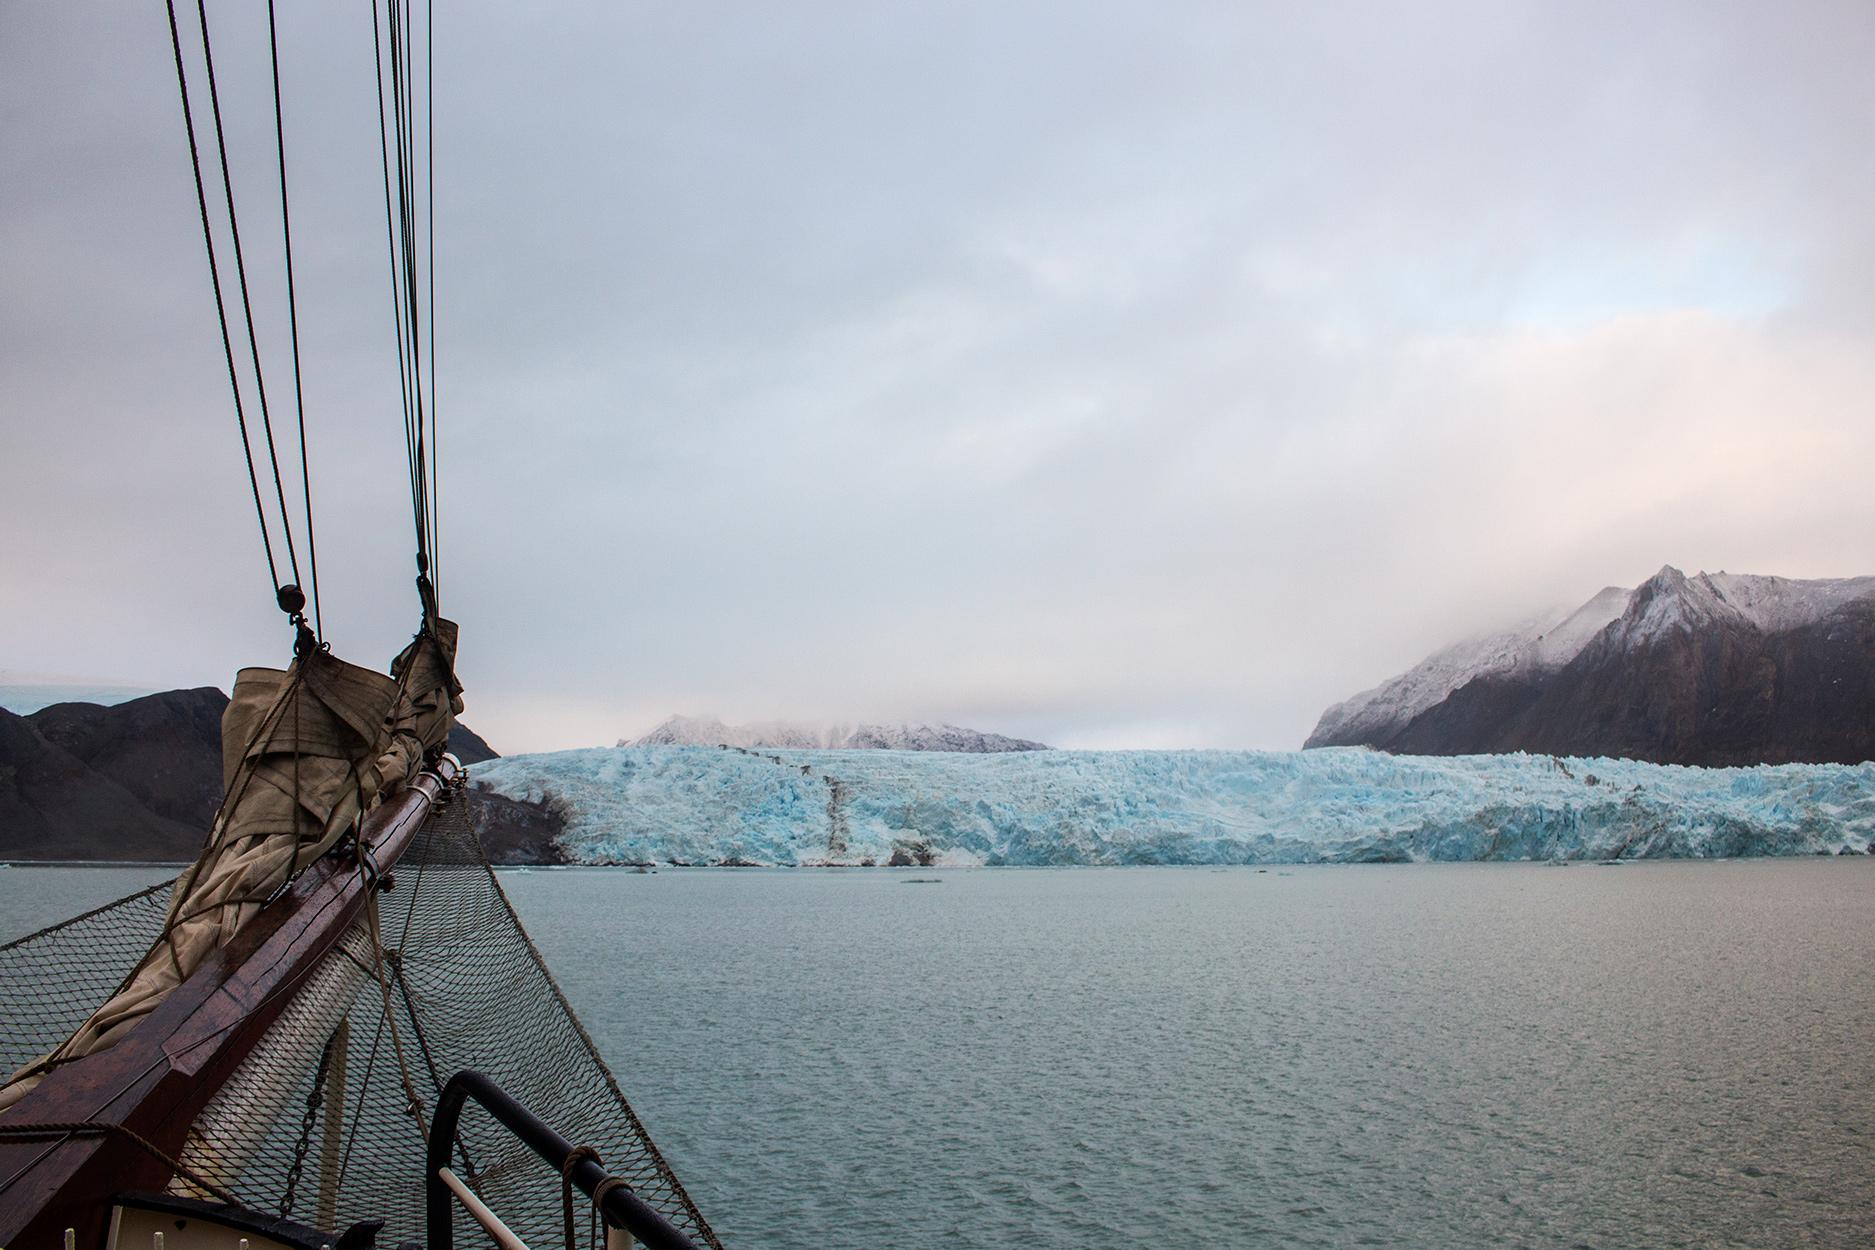 Blomstrandbreen Glacier in Svalbard